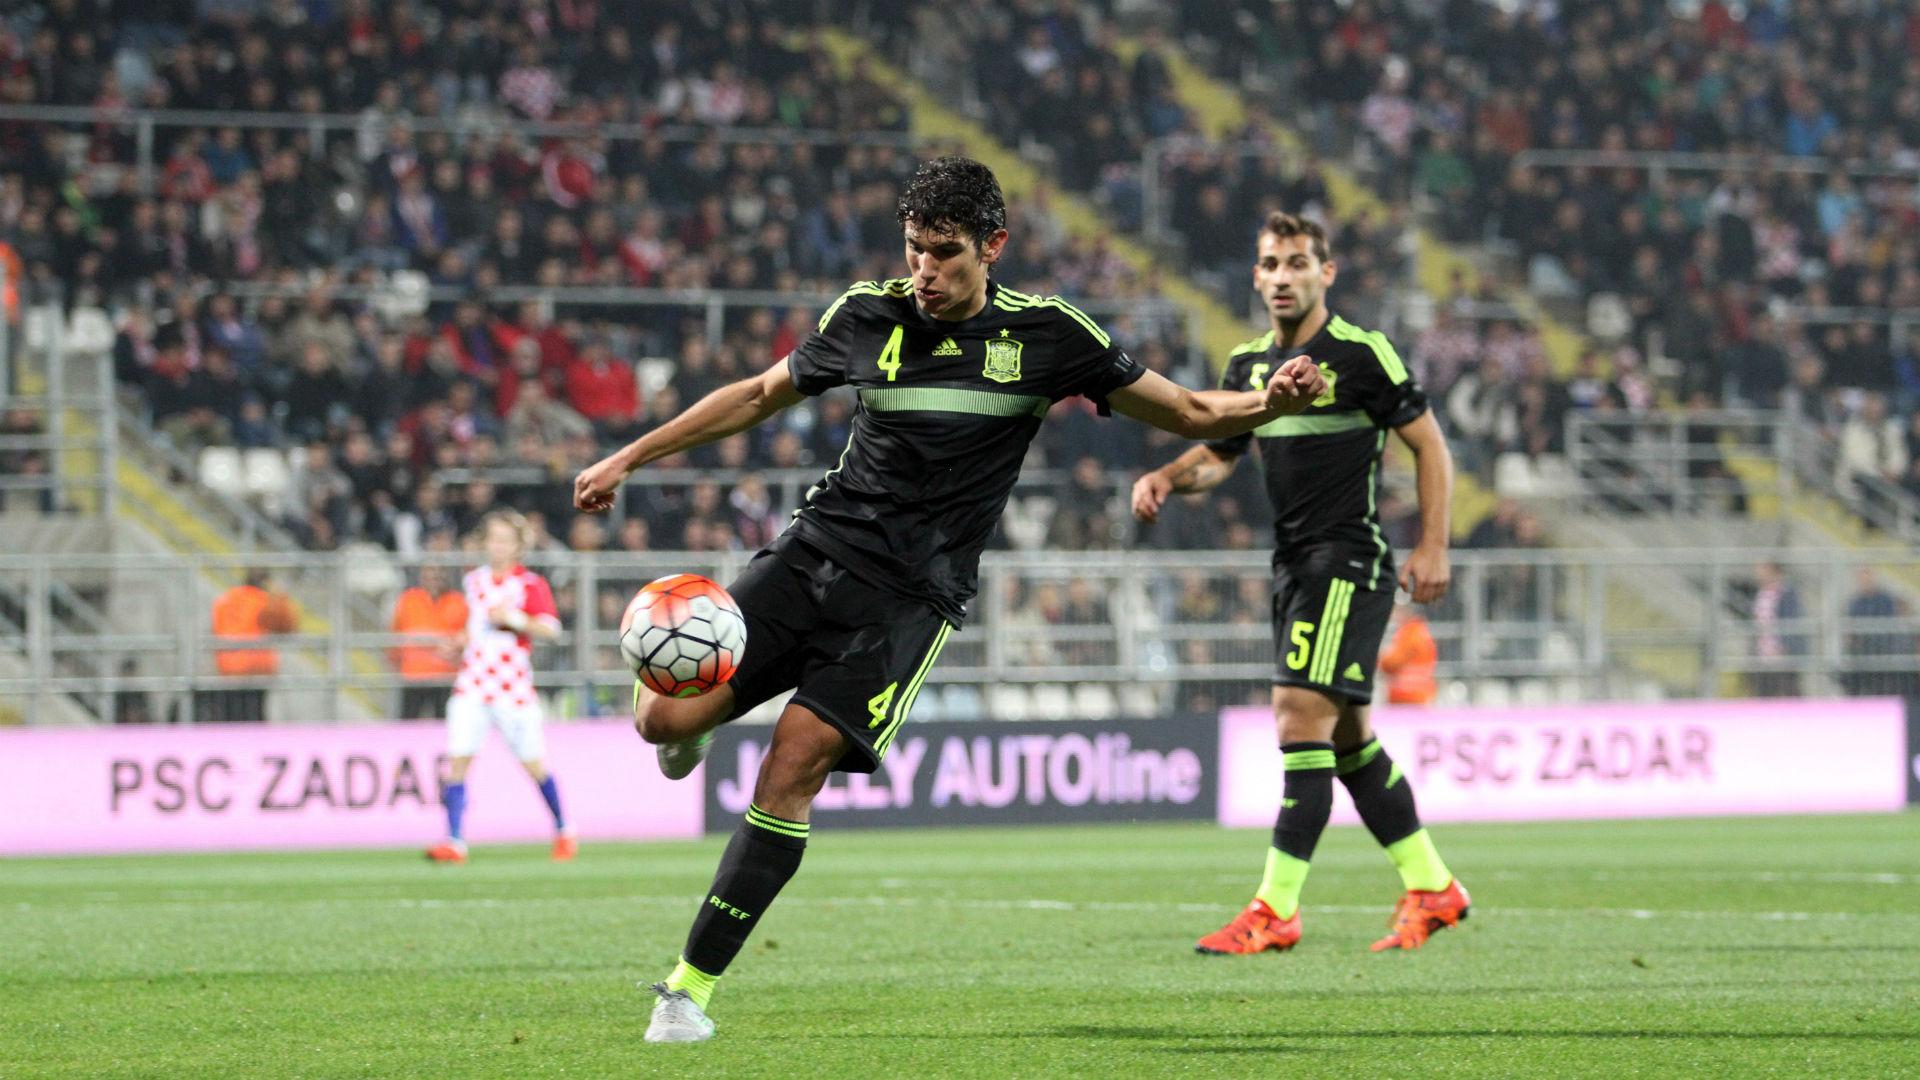 jesus vallejo - croatia u21 spain u21 - qualifier - 17112015